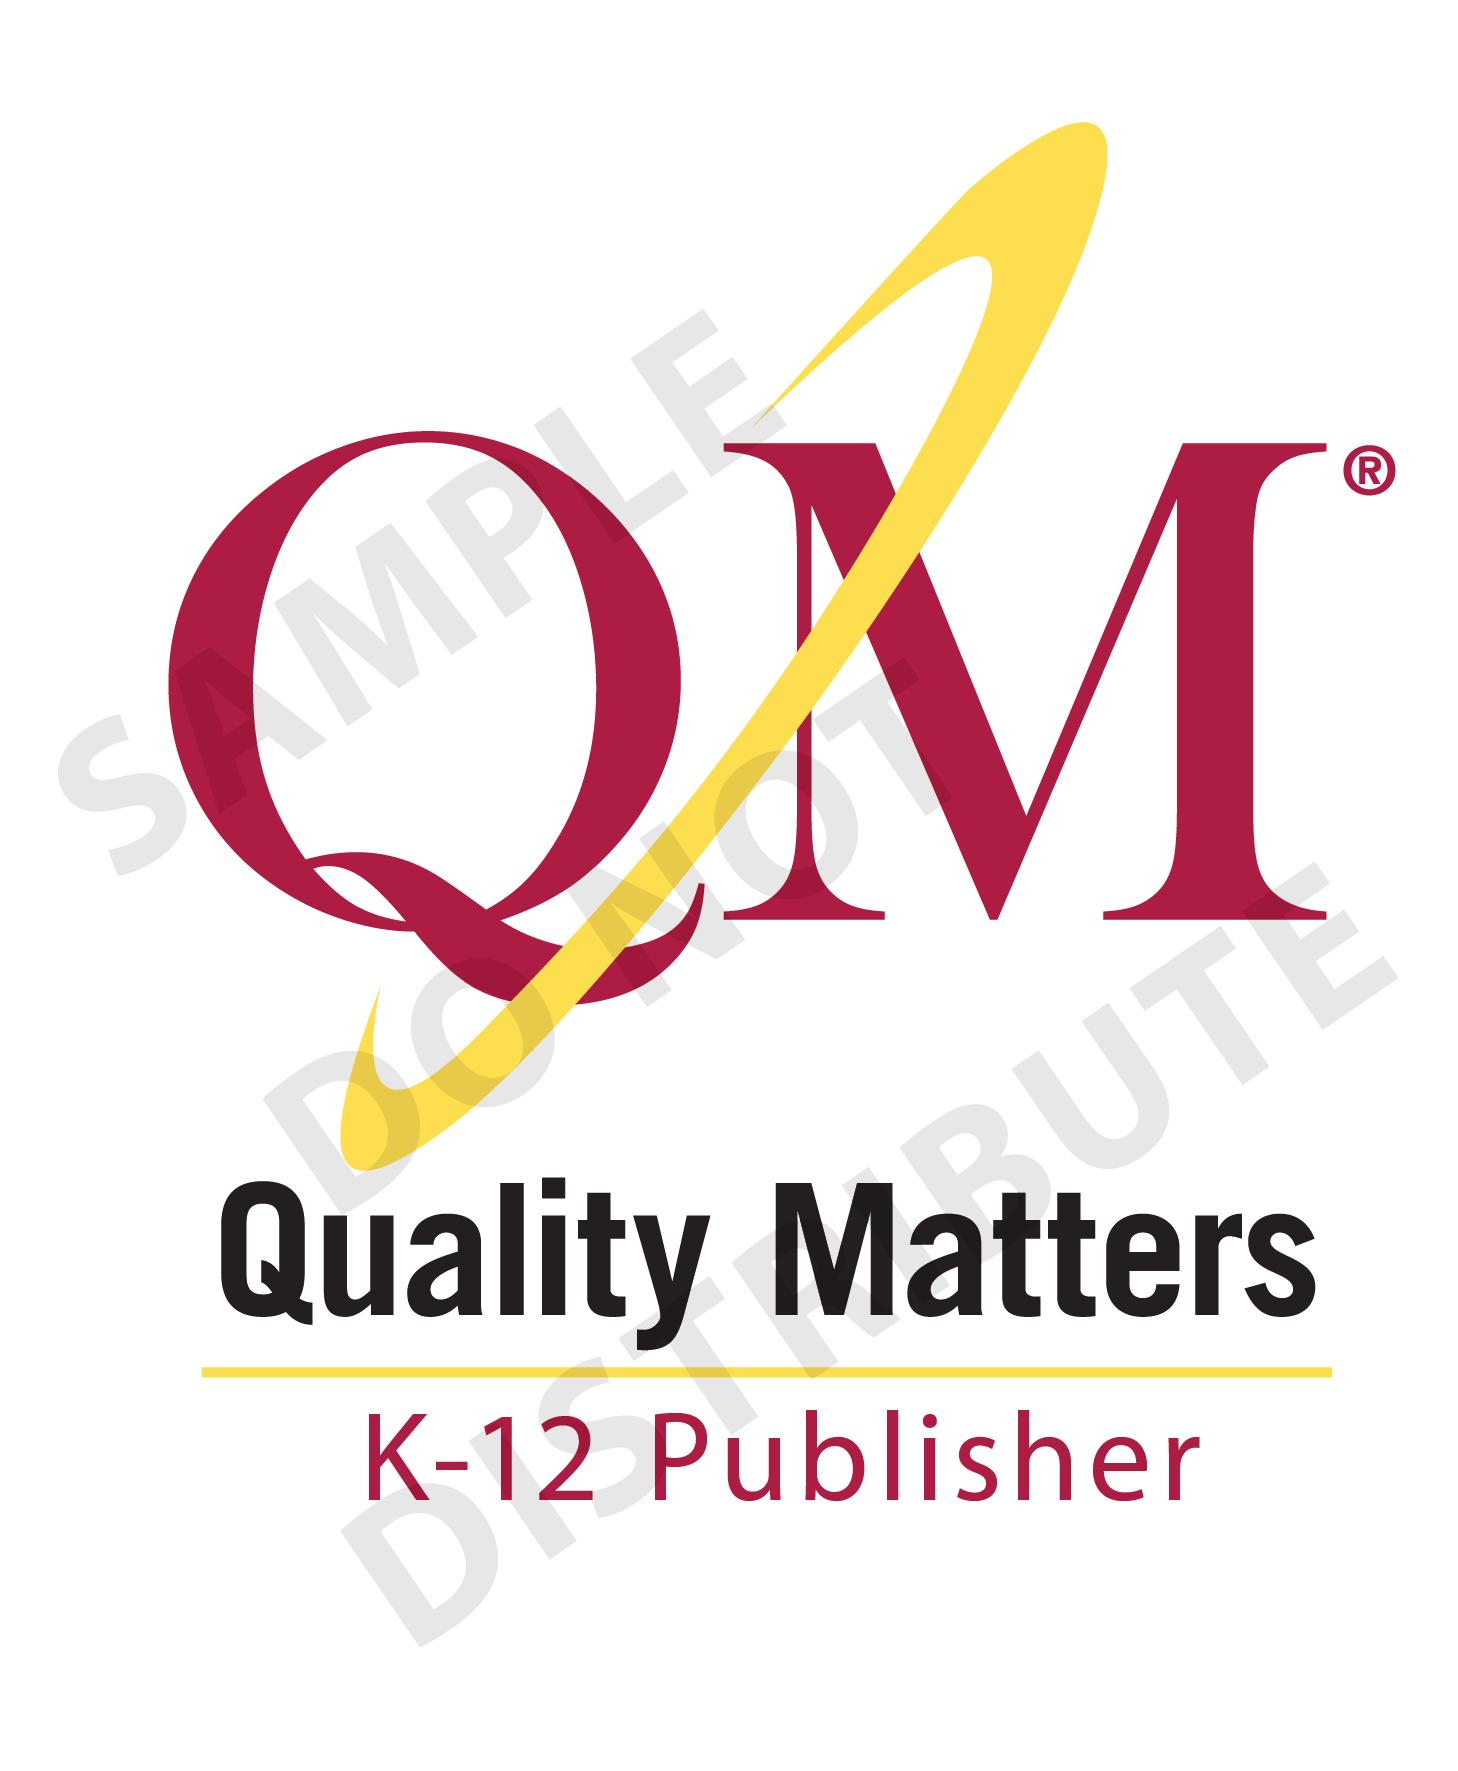 Qm certified course procurement considerations and rfp language qm k 12 publisher sample cert markg 1betcityfo Images